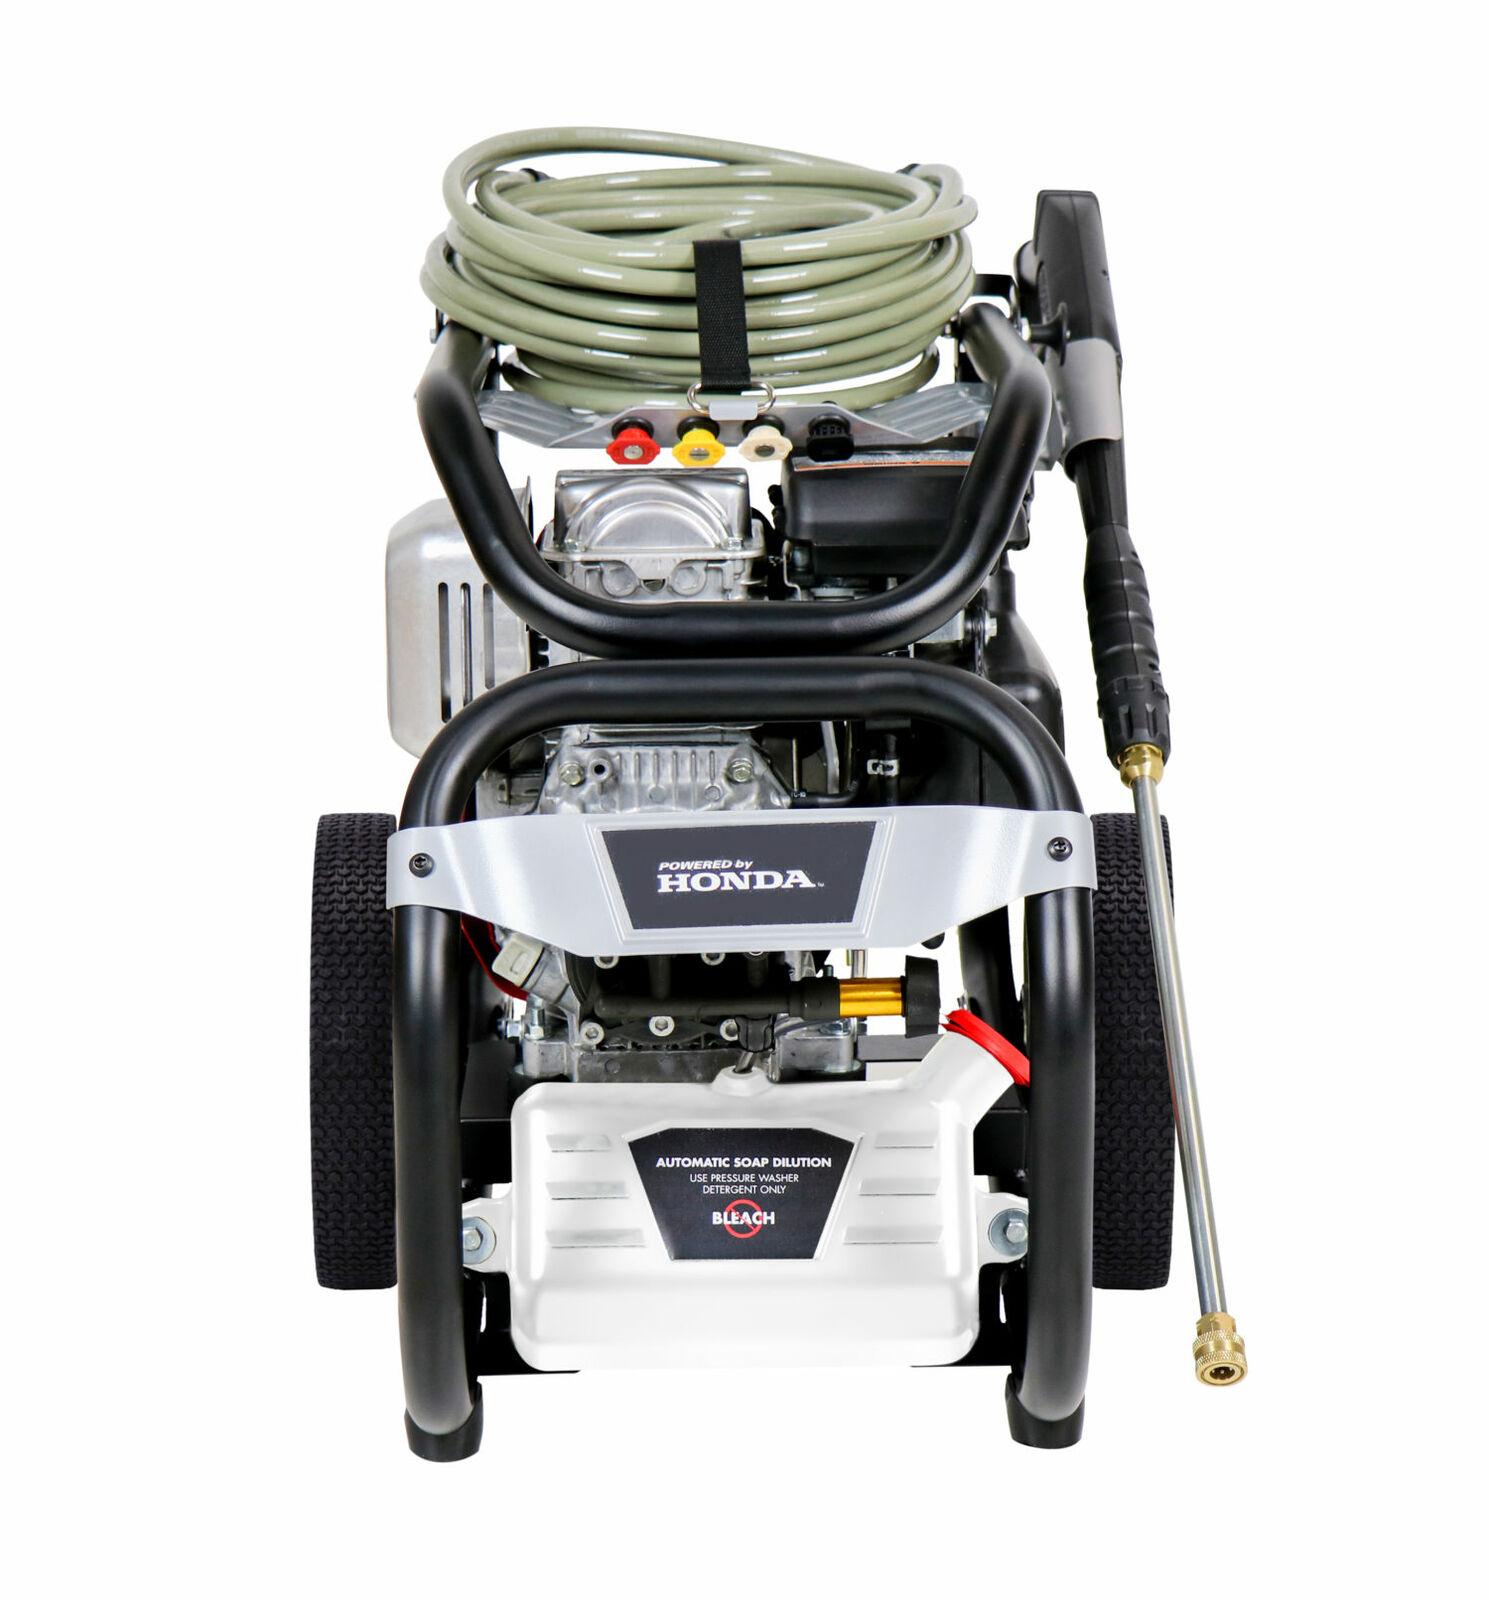 Simpson Megashot 3200 PSI 2 5 GPM Honda GC190 Engine Pressure Washer